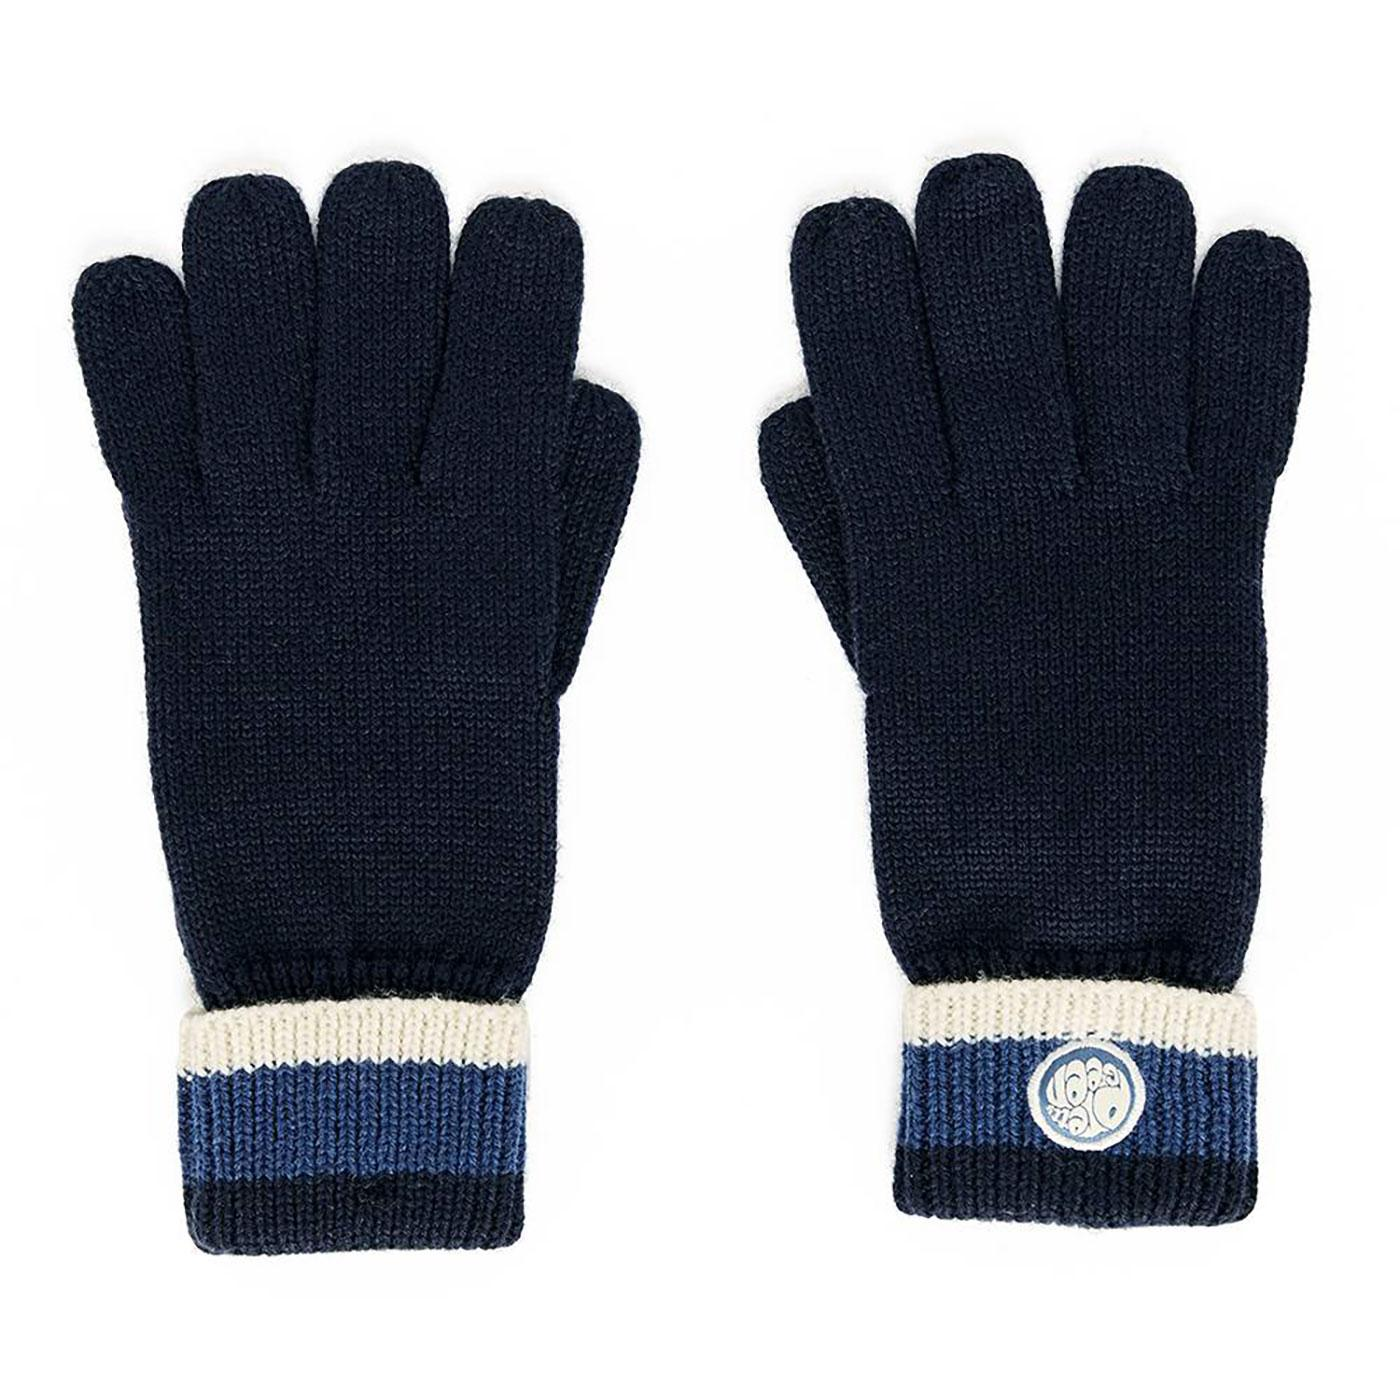 PRETTY GREEN Retro Stripe Knitted Wool Gloves